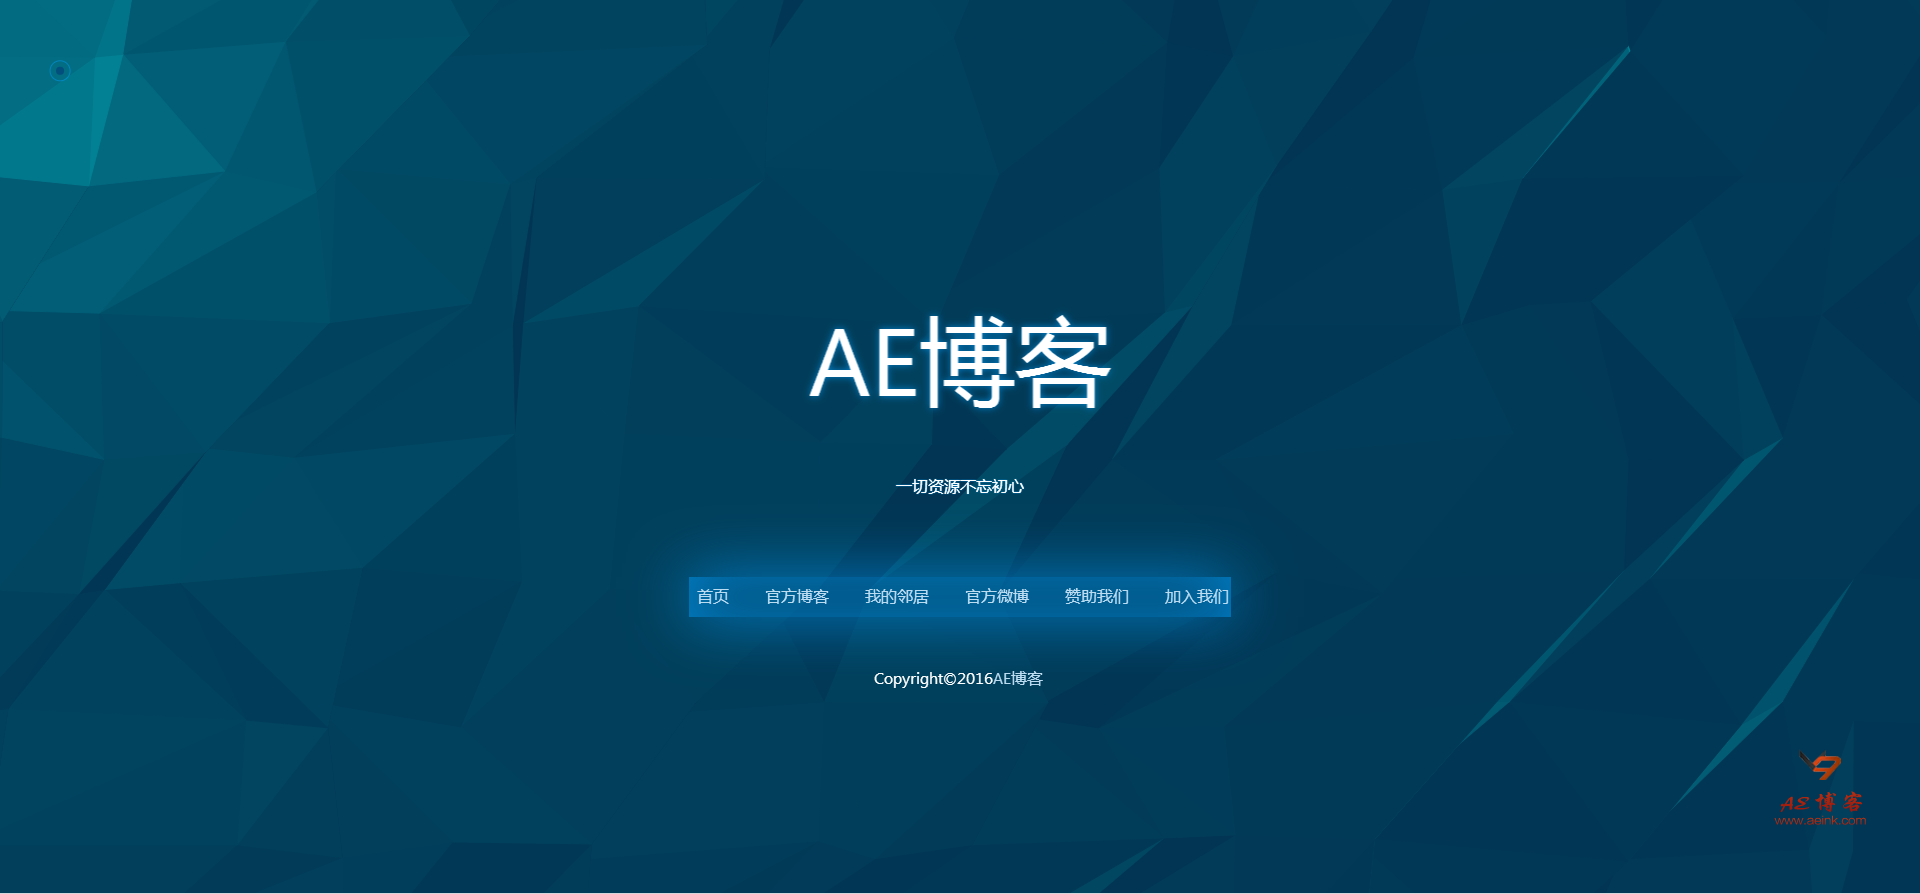 AE博客 - 墨渊.png